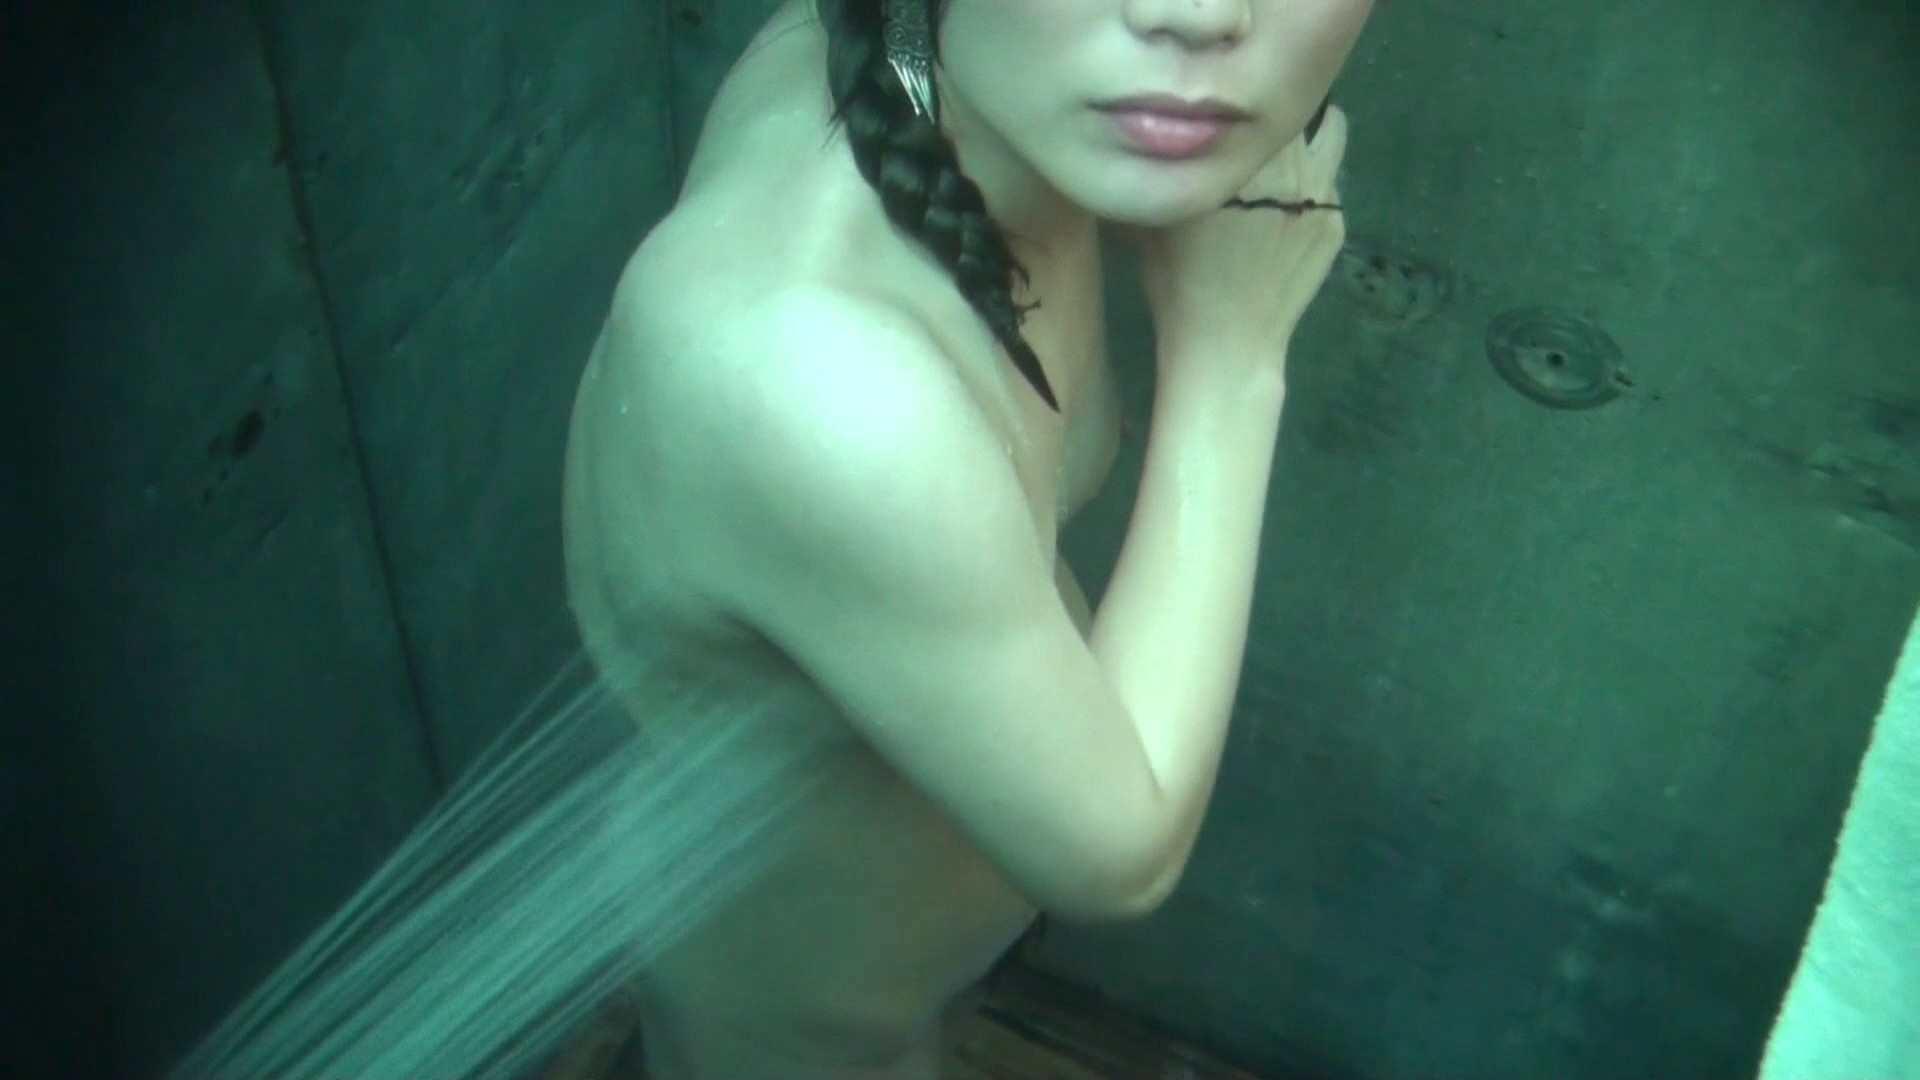 Vol.12 女性の性器には予想外の砂が混入しているようです。 細身体型 オメコ無修正動画無料 111枚 58